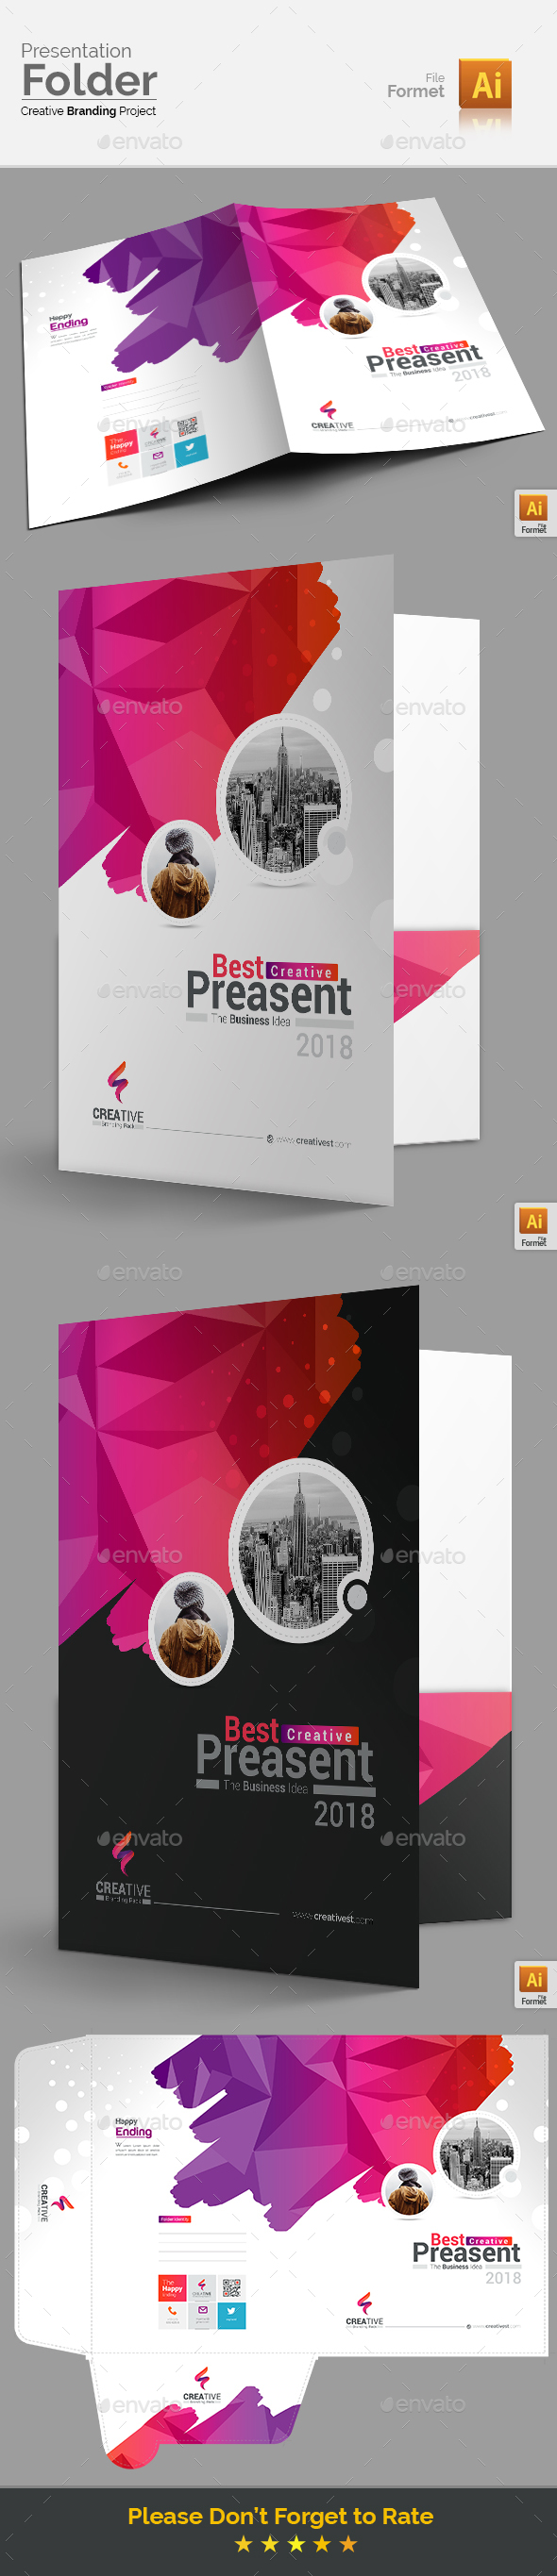 Modern Presentation Folder - Stationery Print Templates